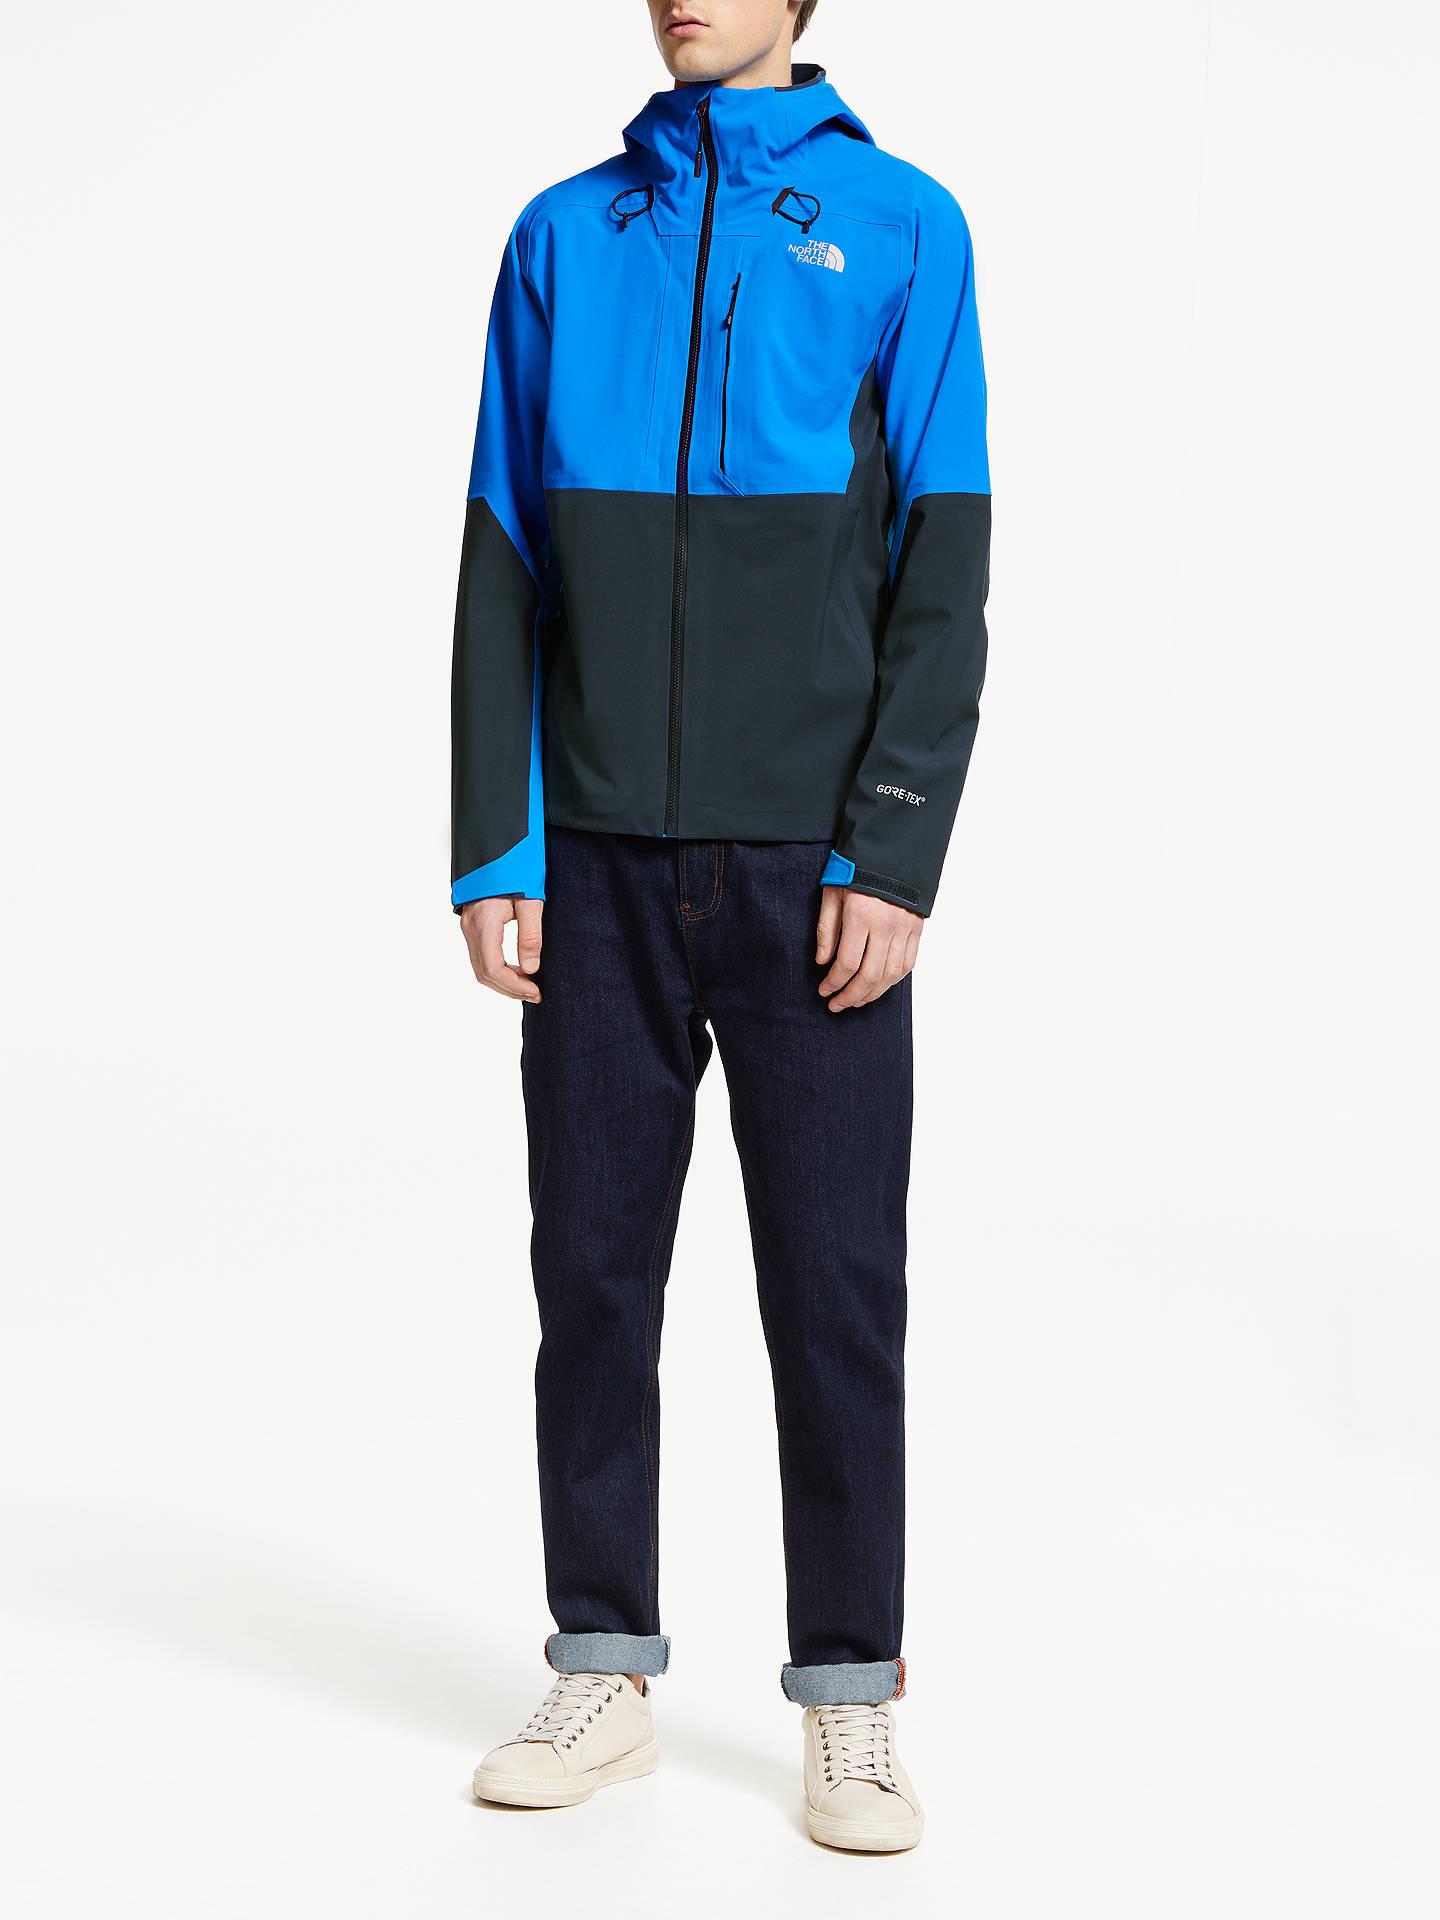 ... BuyThe North Face Apex Flex GTX 2.0 Men s Waterproof Jacket edf2e059b